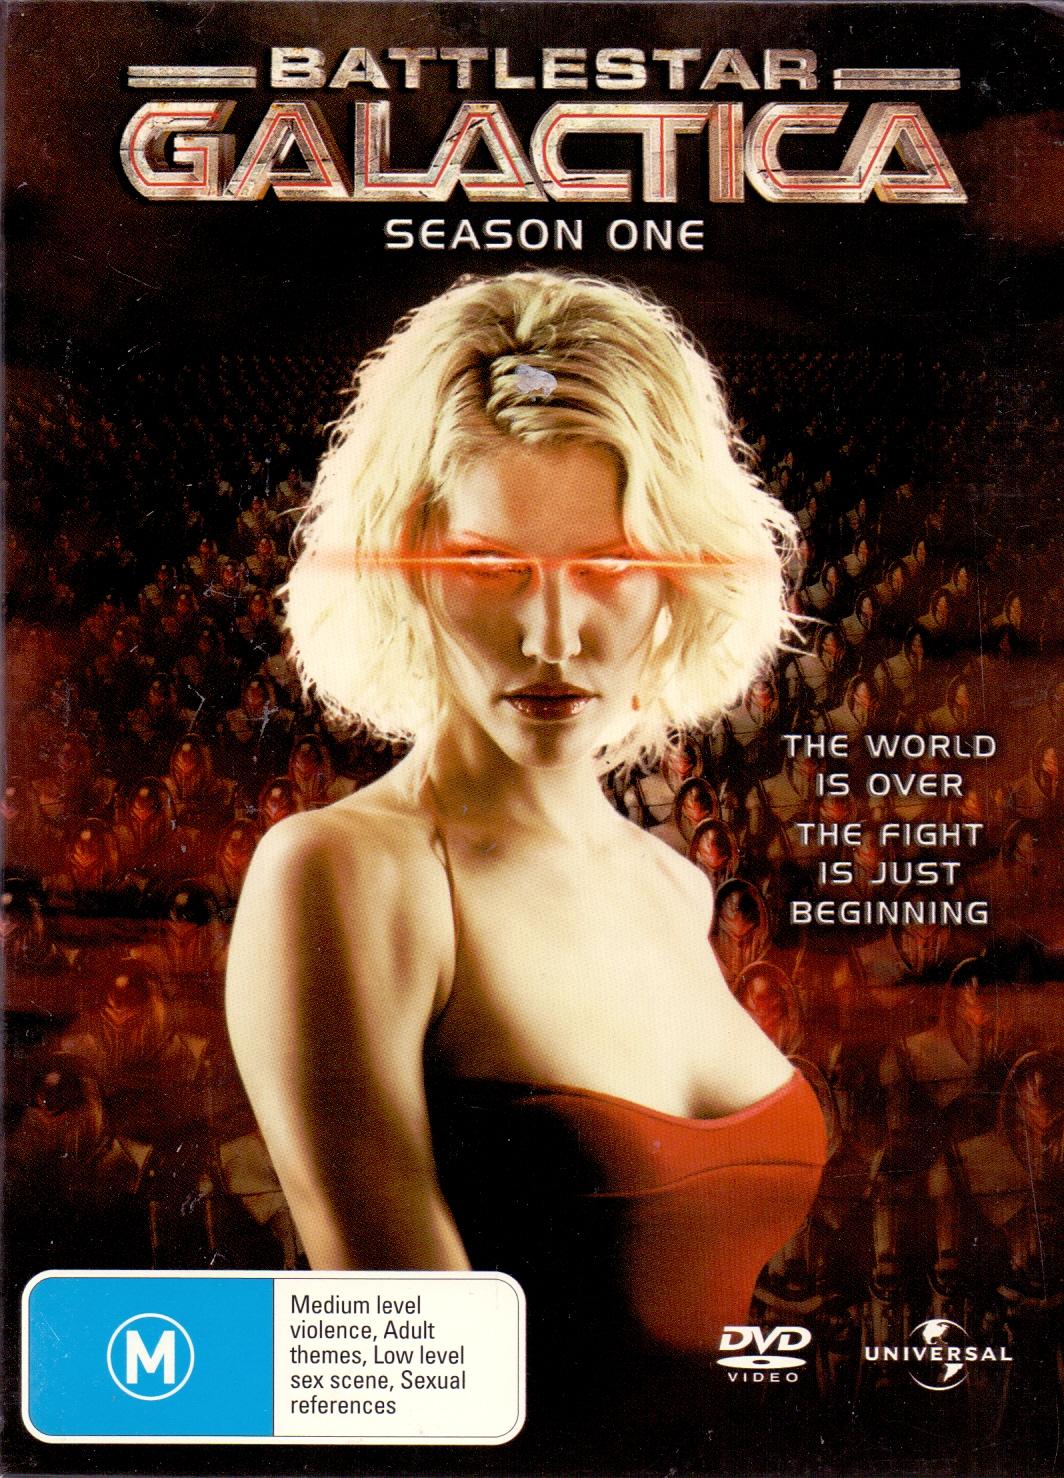 Battlestar Galactica: Season One [4 DVD, AU Import]